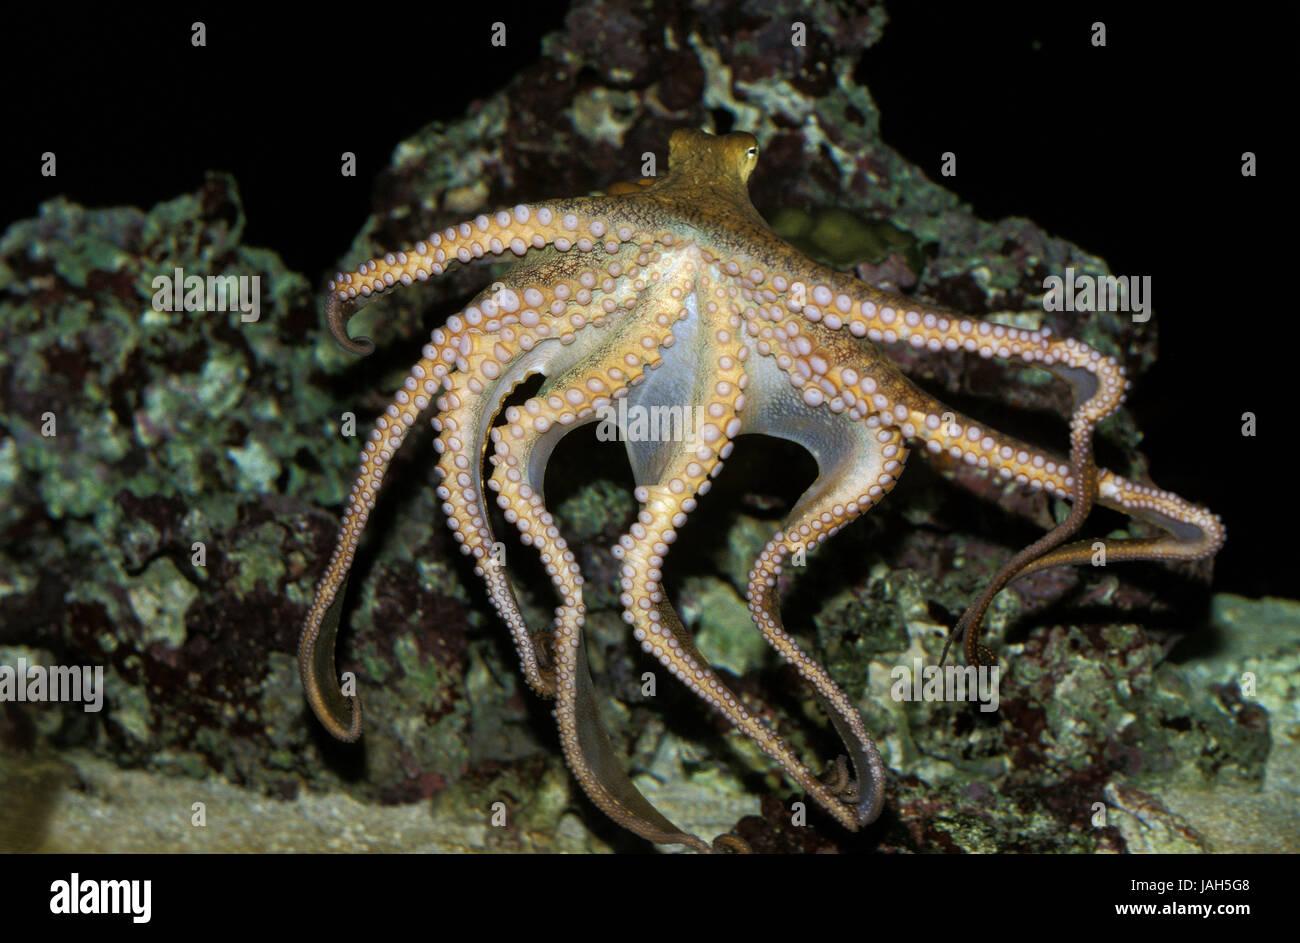 Tintenfisch, Octopus SP., Schwimmen, Tentakel, Stockbild